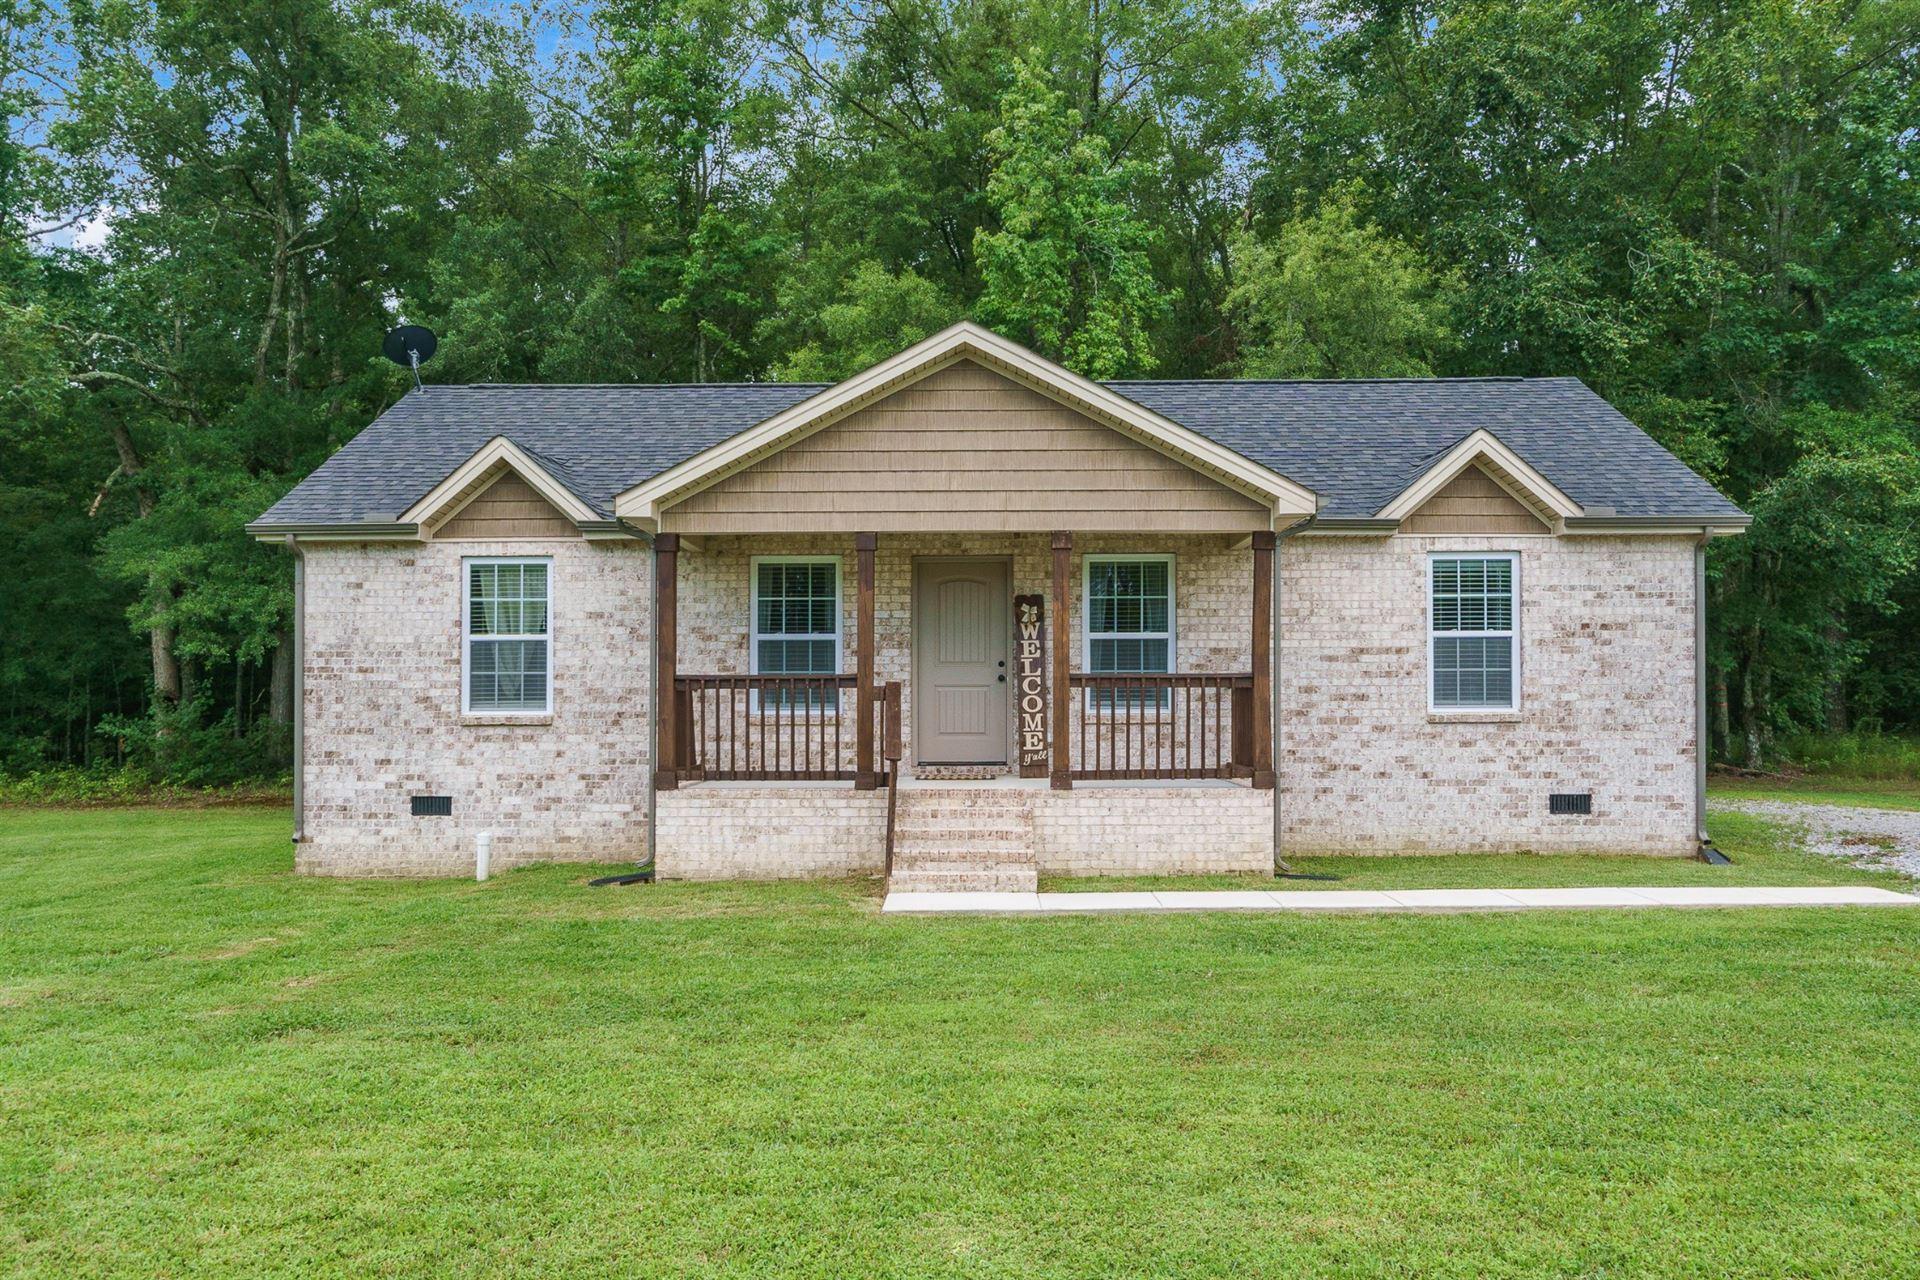 115 Evergreen Ln, Smithville, TN 37166 - MLS#: 2276153